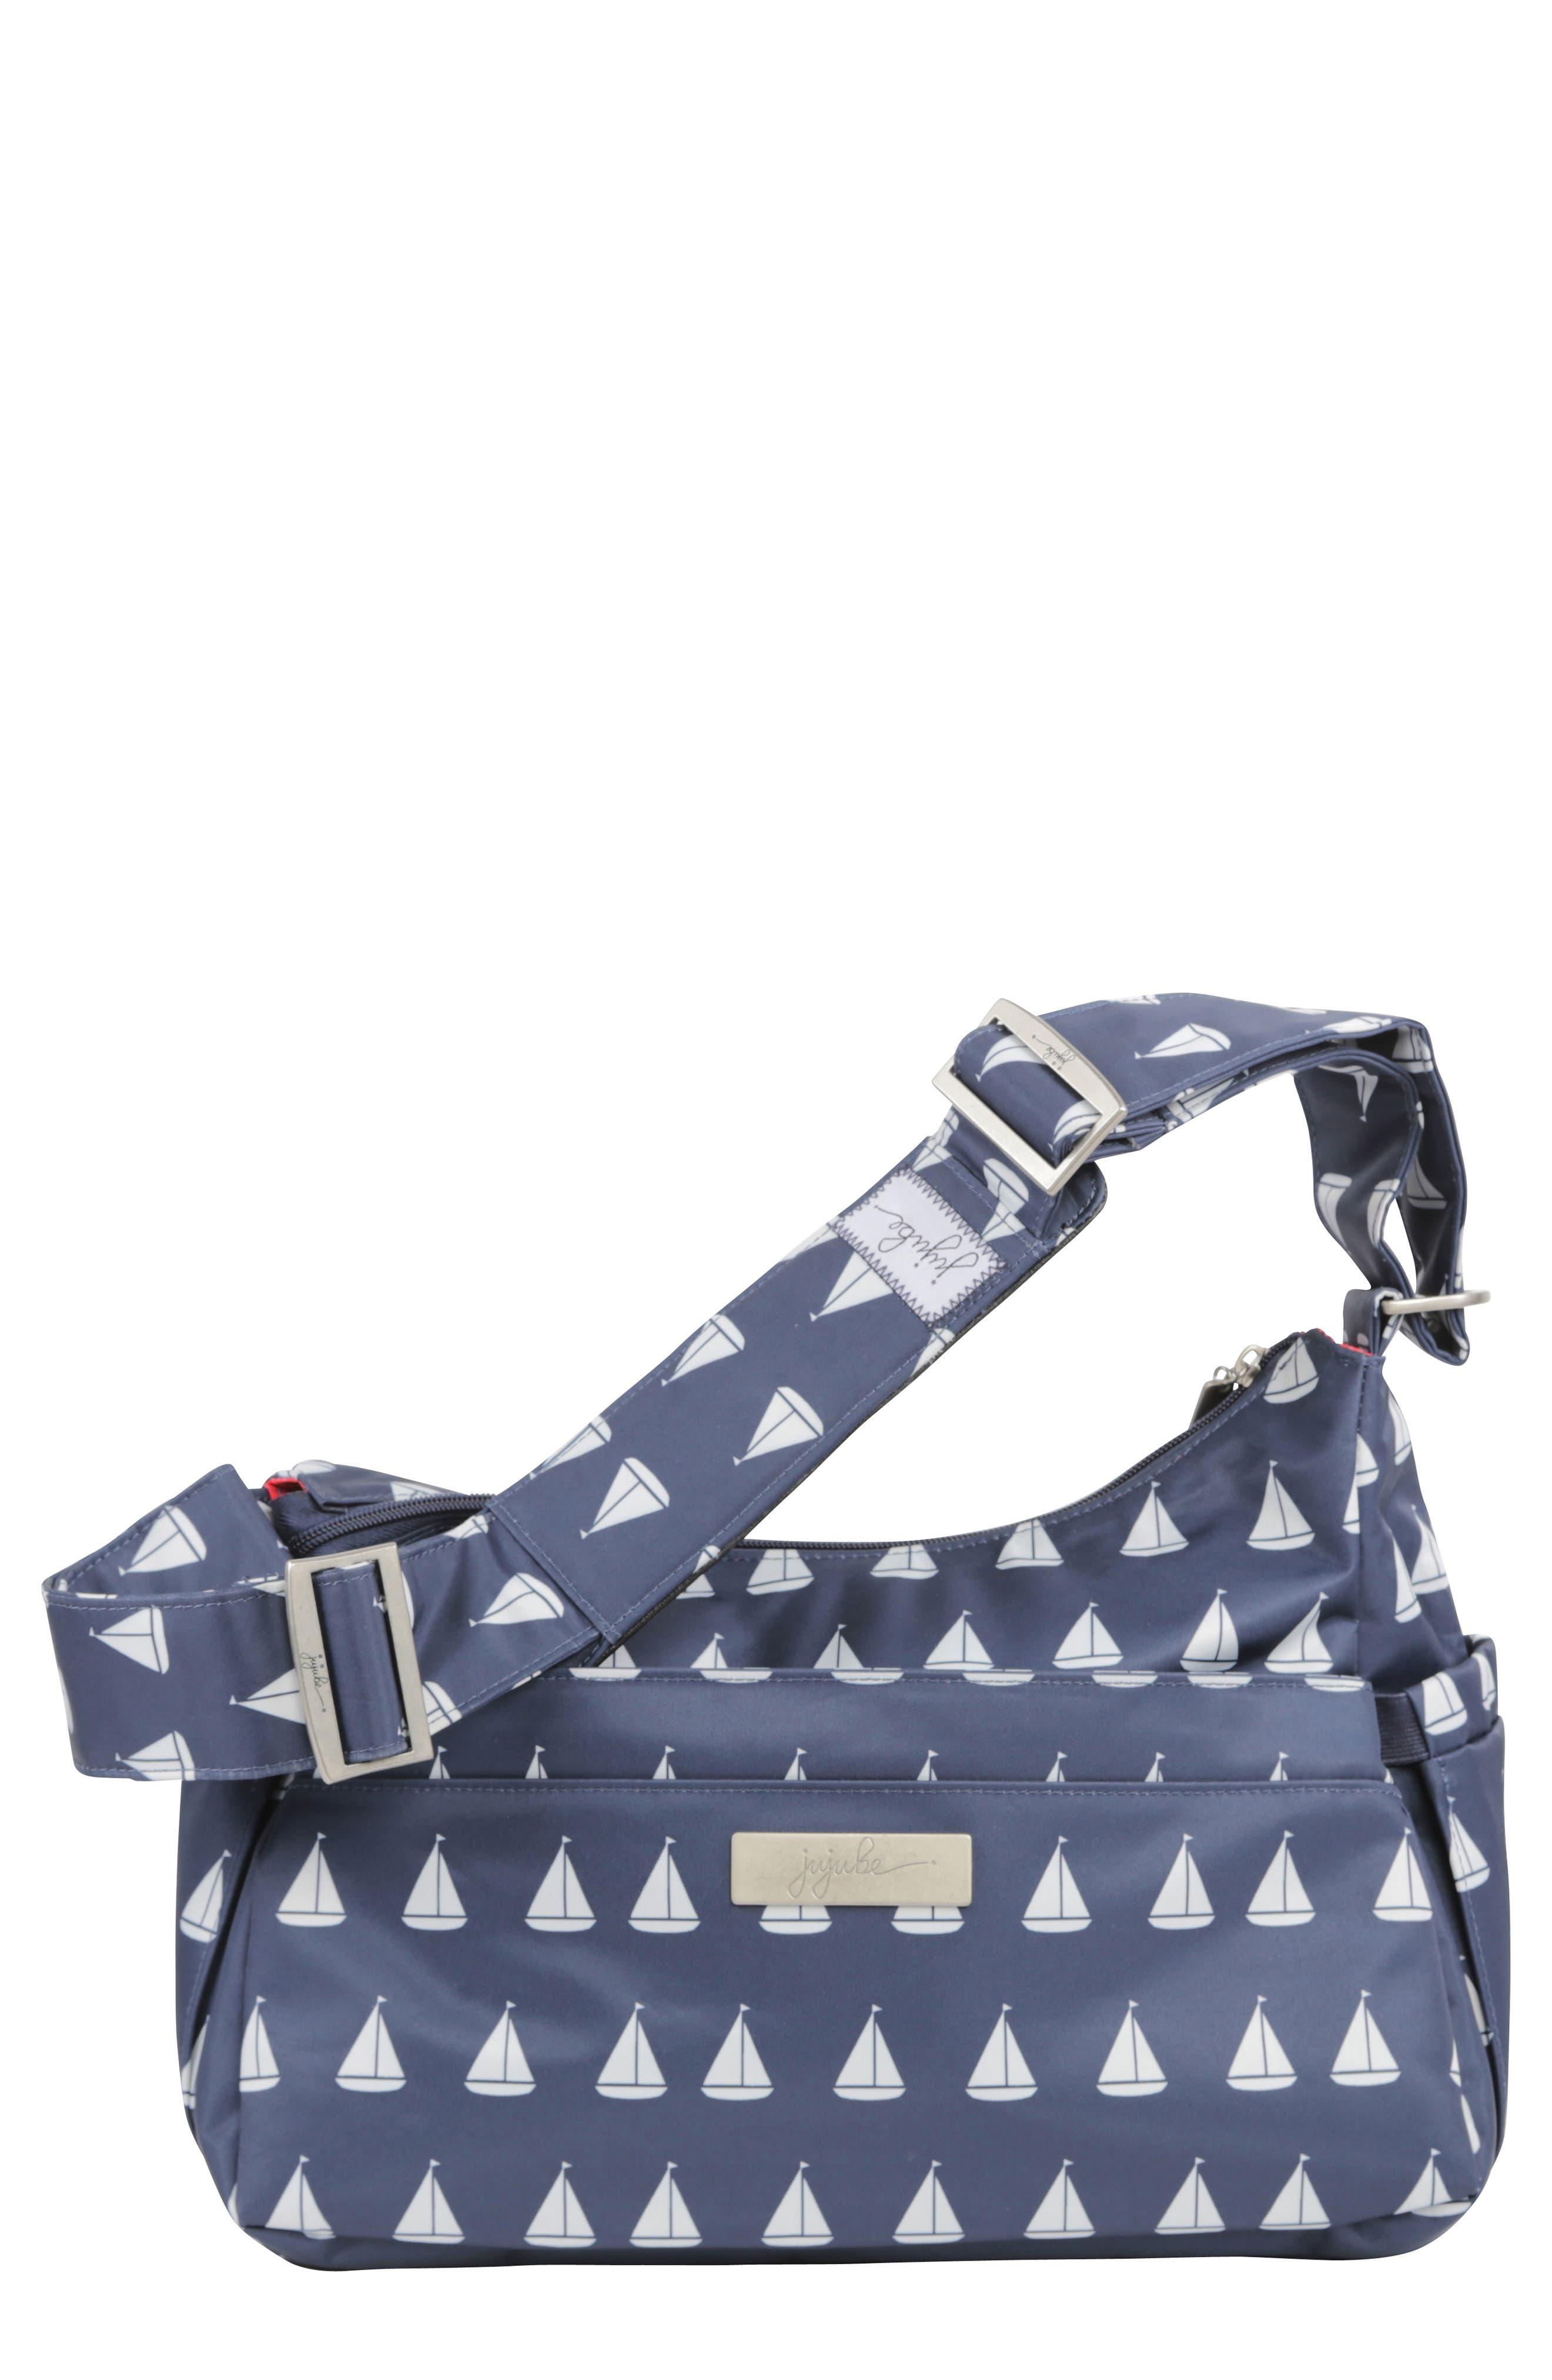 Alternate Image 1 Selected - Ju-Ju-Be HoboBe - Coastal Collection Diaper Bag